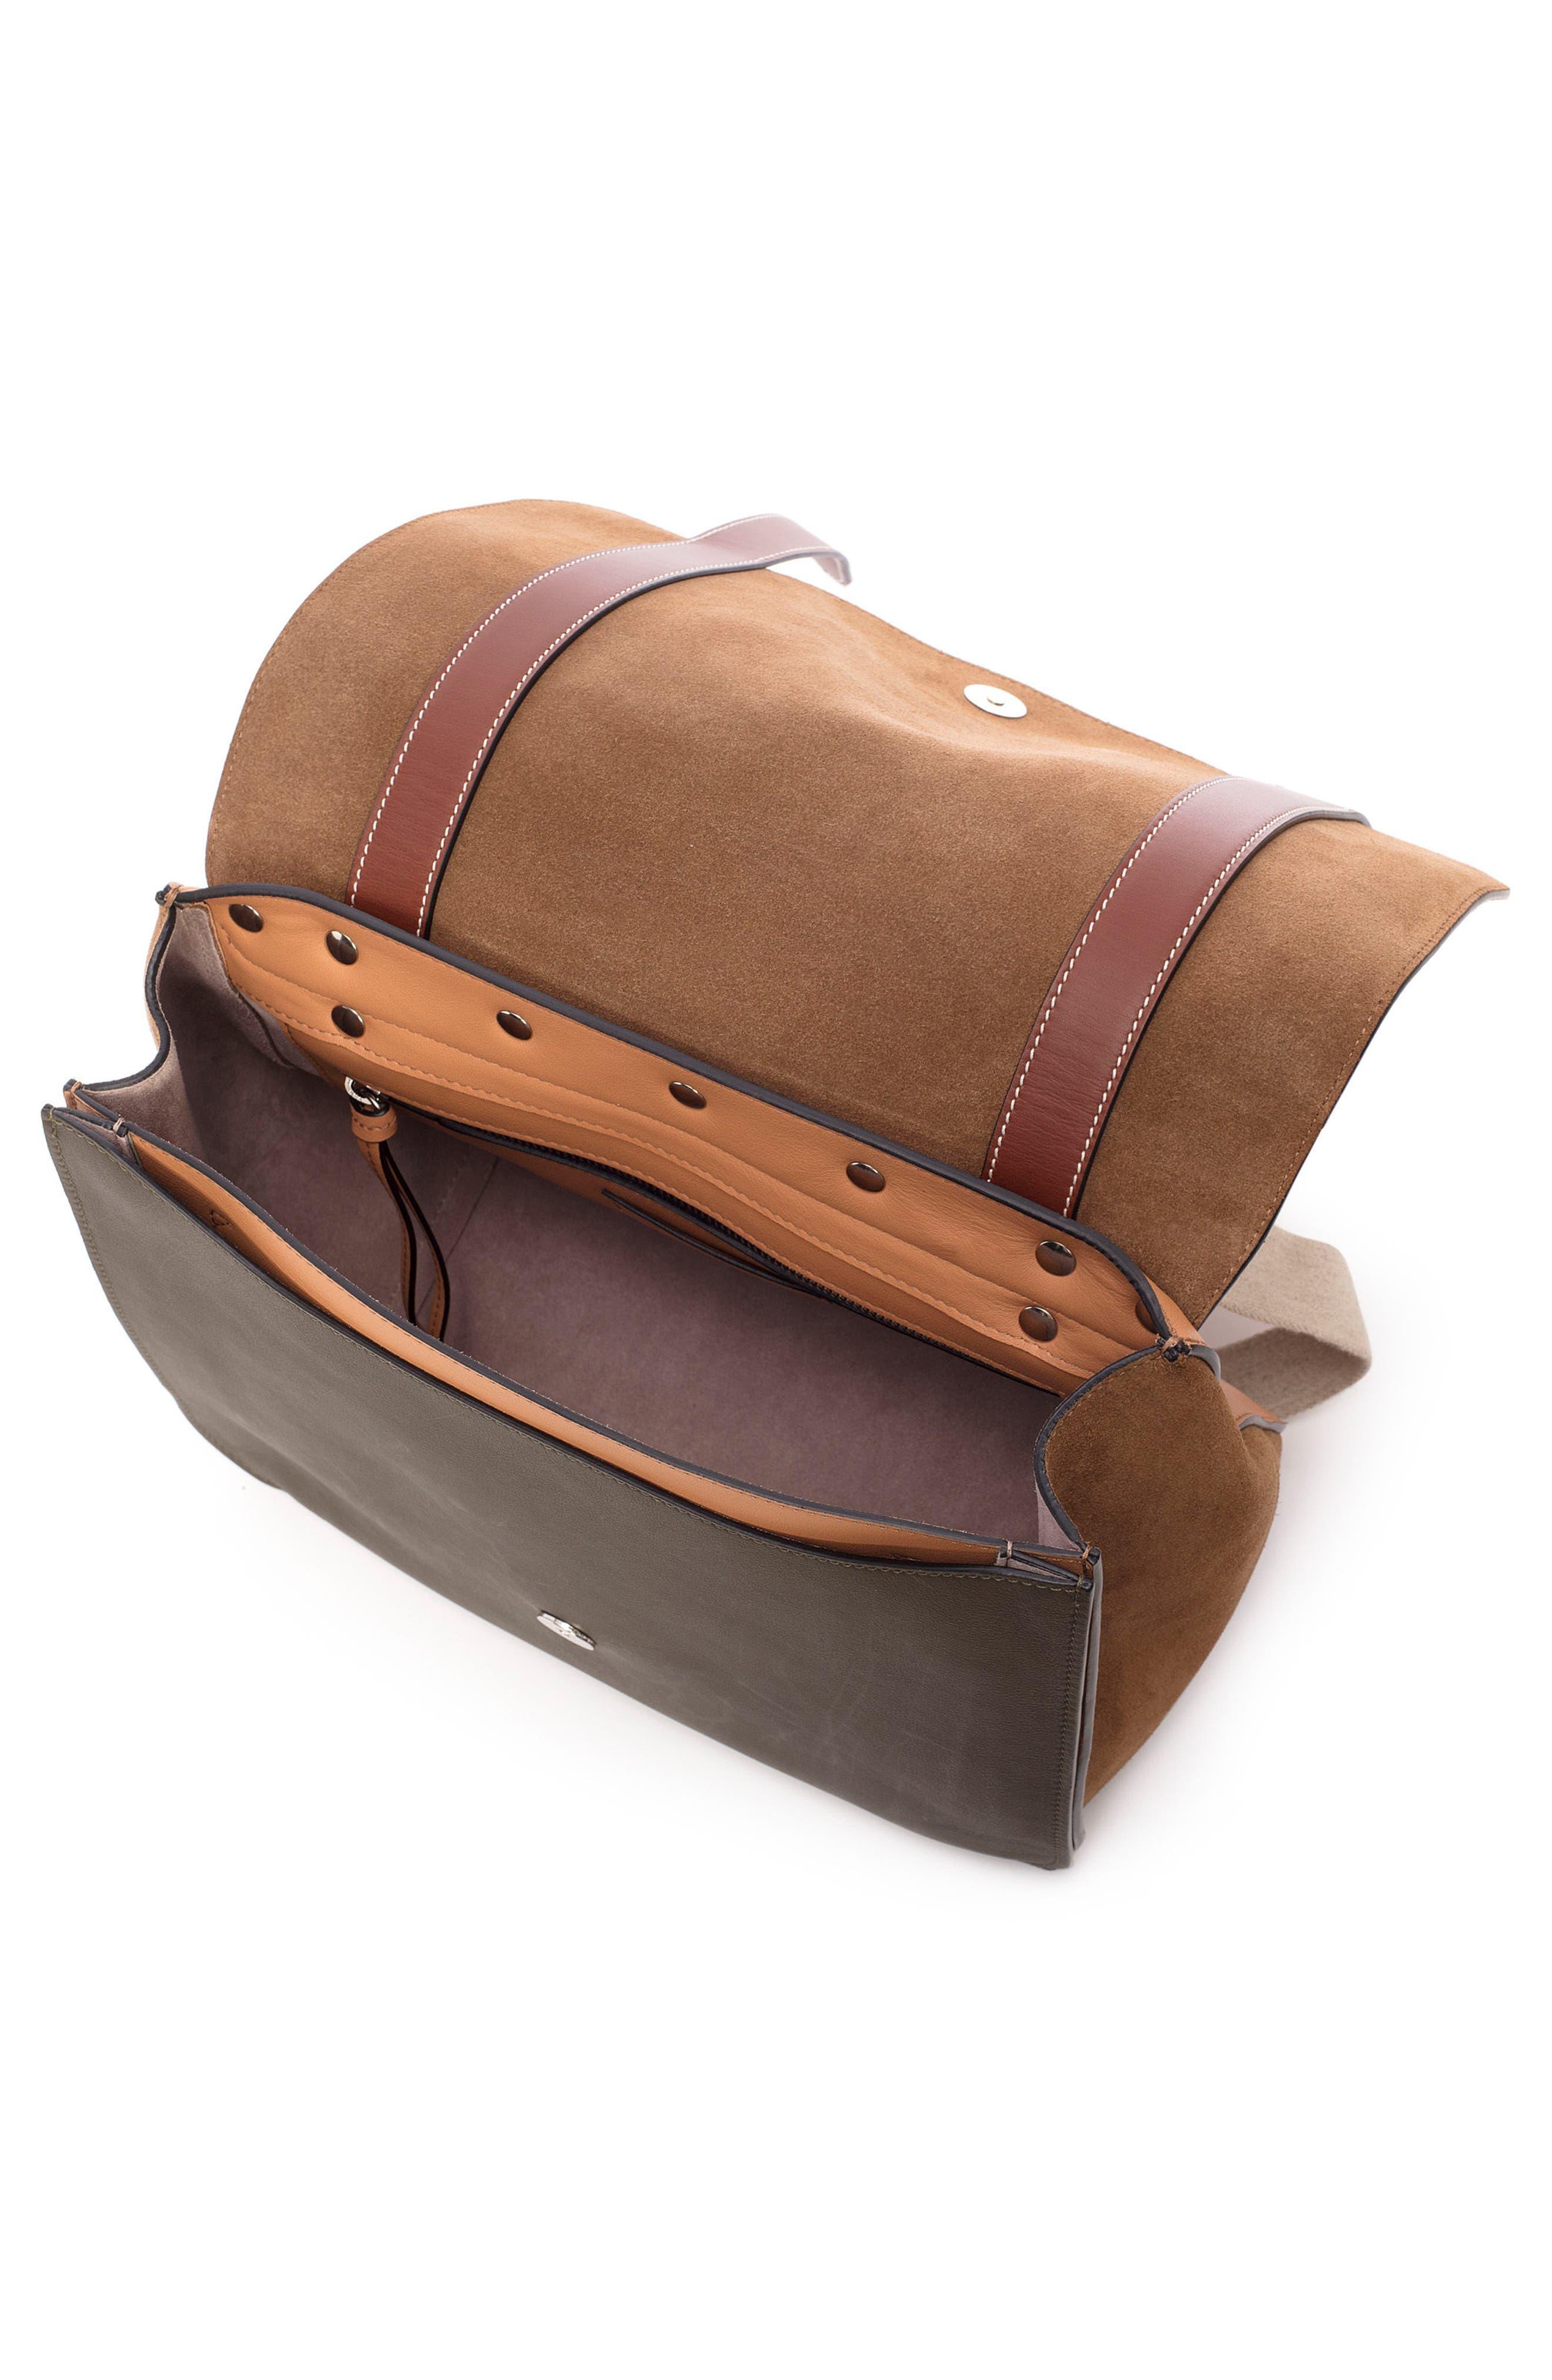 JW ANDERSON,                             Disc Leather Top Handle Satchel,                             Alternate thumbnail 3, color,                             CHESTNUT